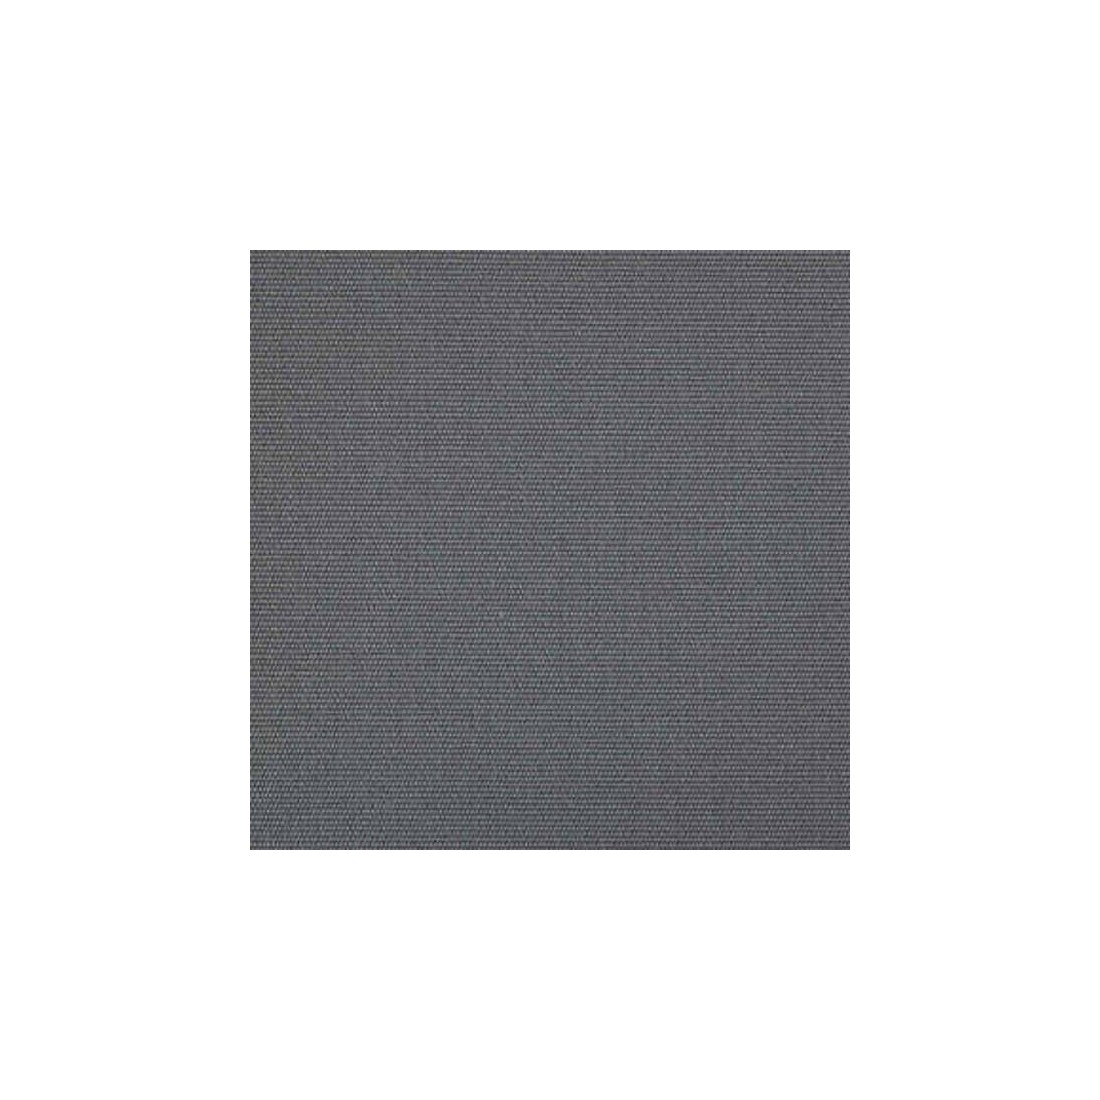 Tissu d'ameublement Playa de Boussac coloris Anthracite O7730010